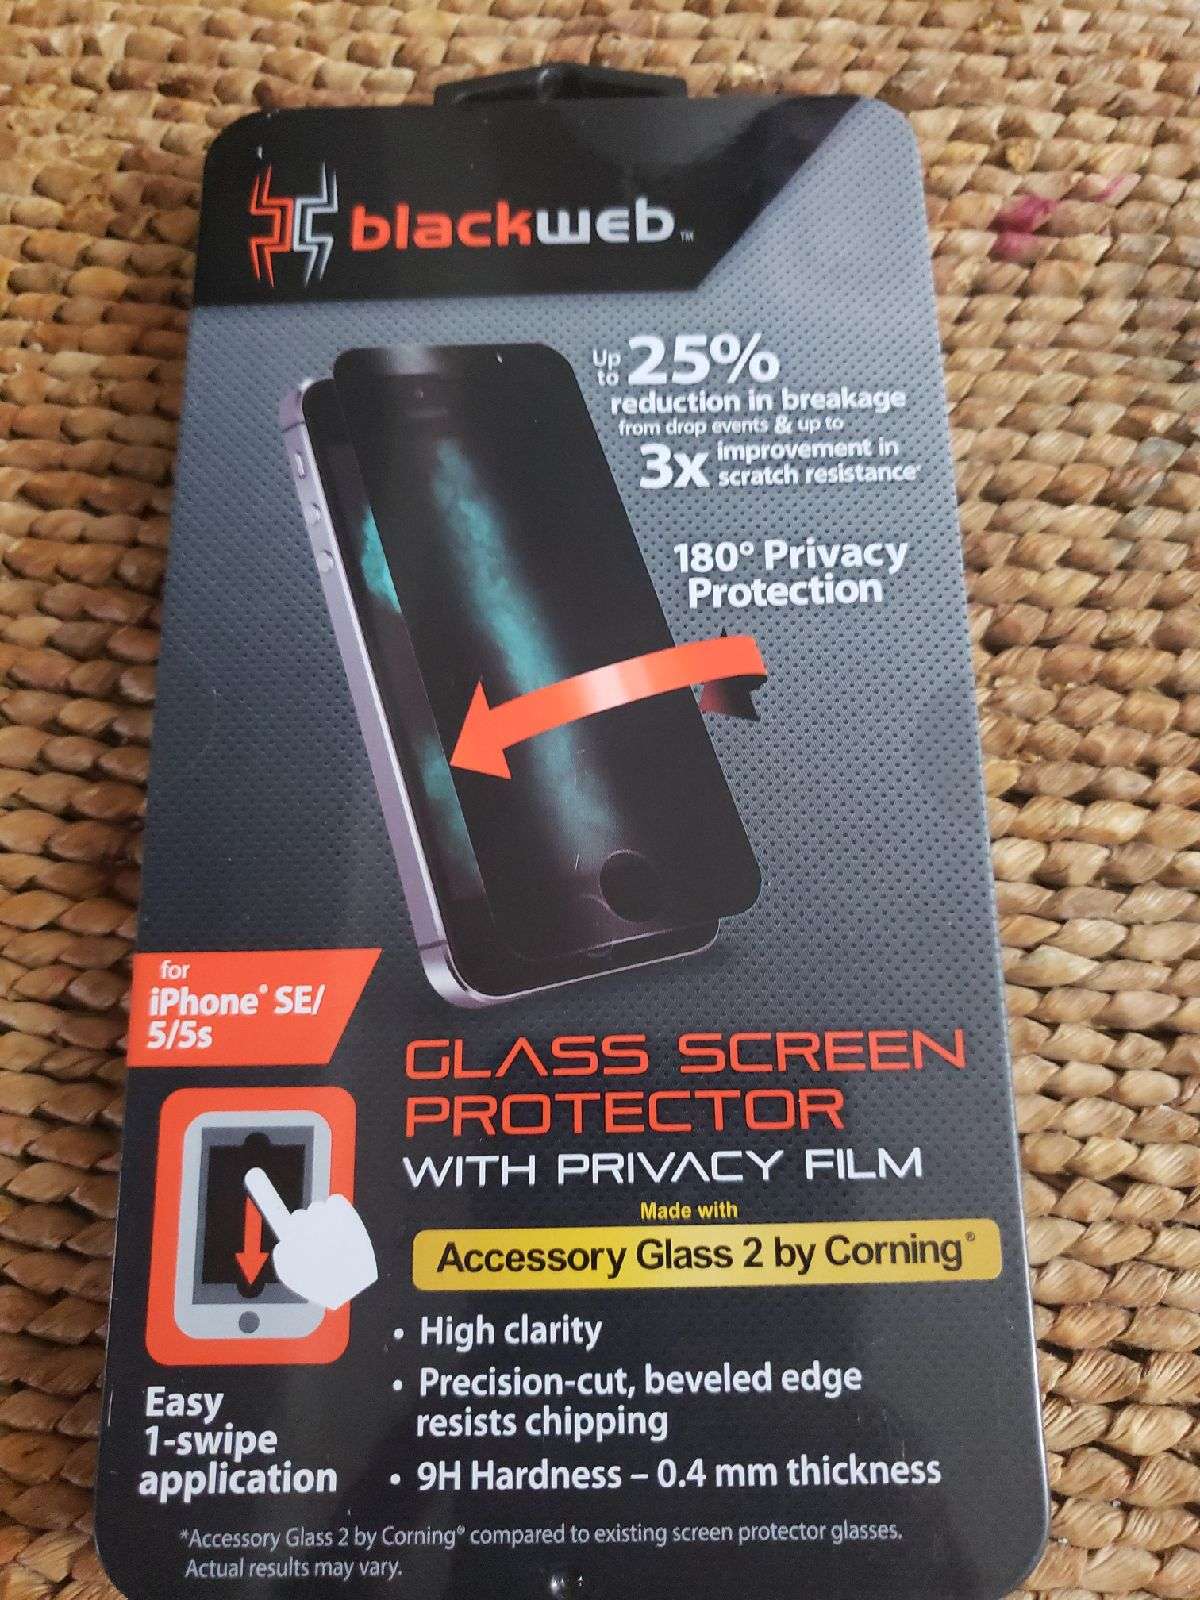 Glass screen iPhone SE/5/5s